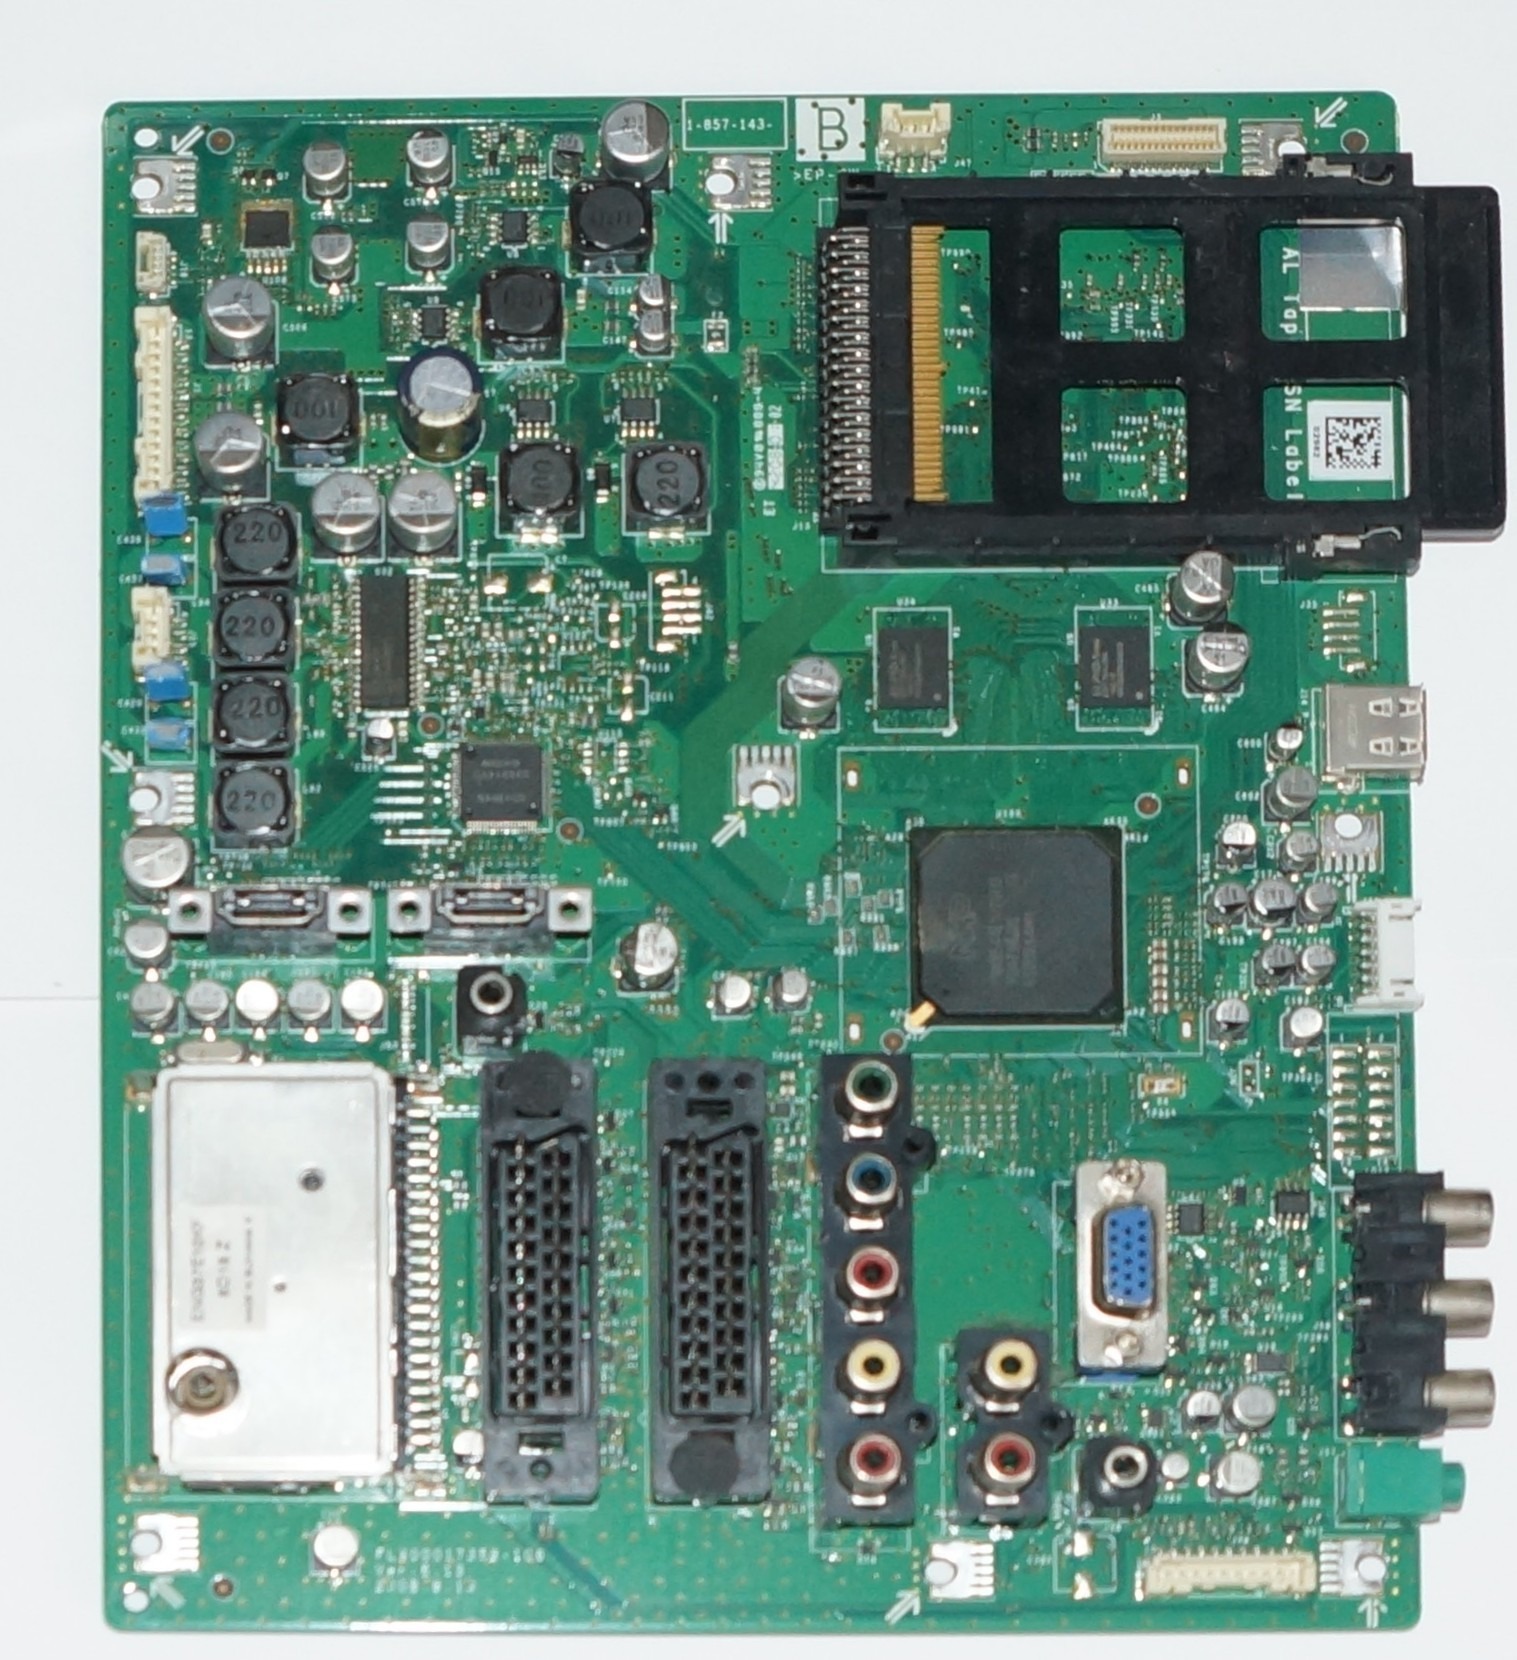 FLX00017358-106 VER:5.13 1-857-382-11 mainboard телевизора Sony